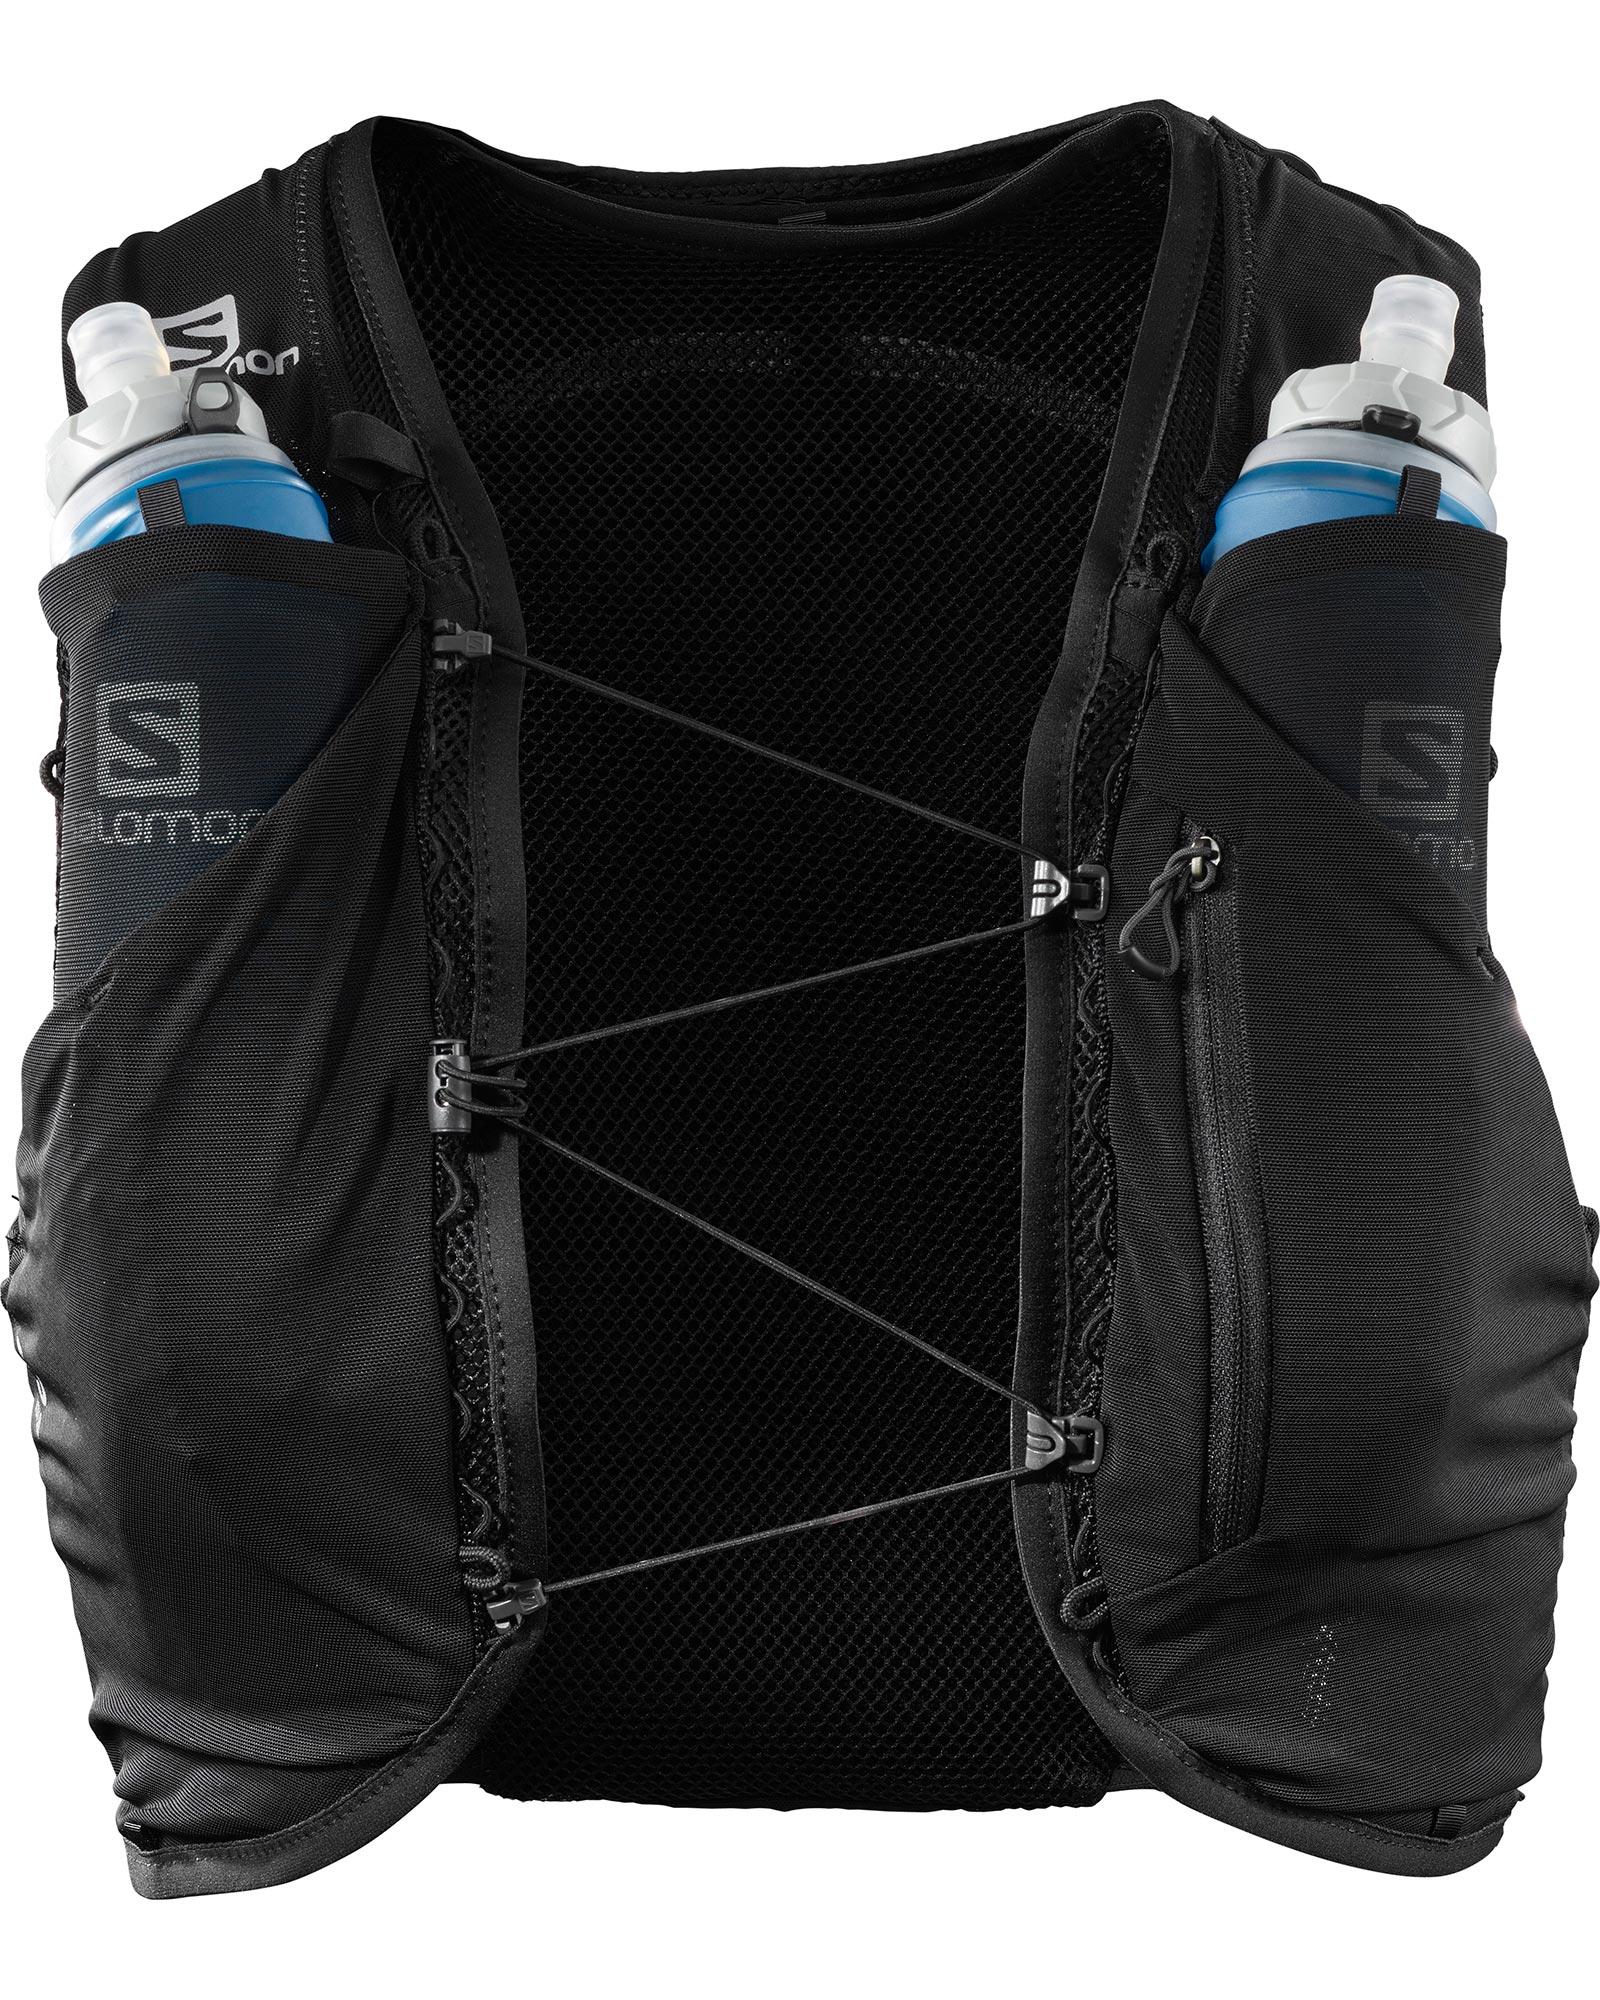 Salomon Mens Alp High Leather Gore-tex Walking Boots